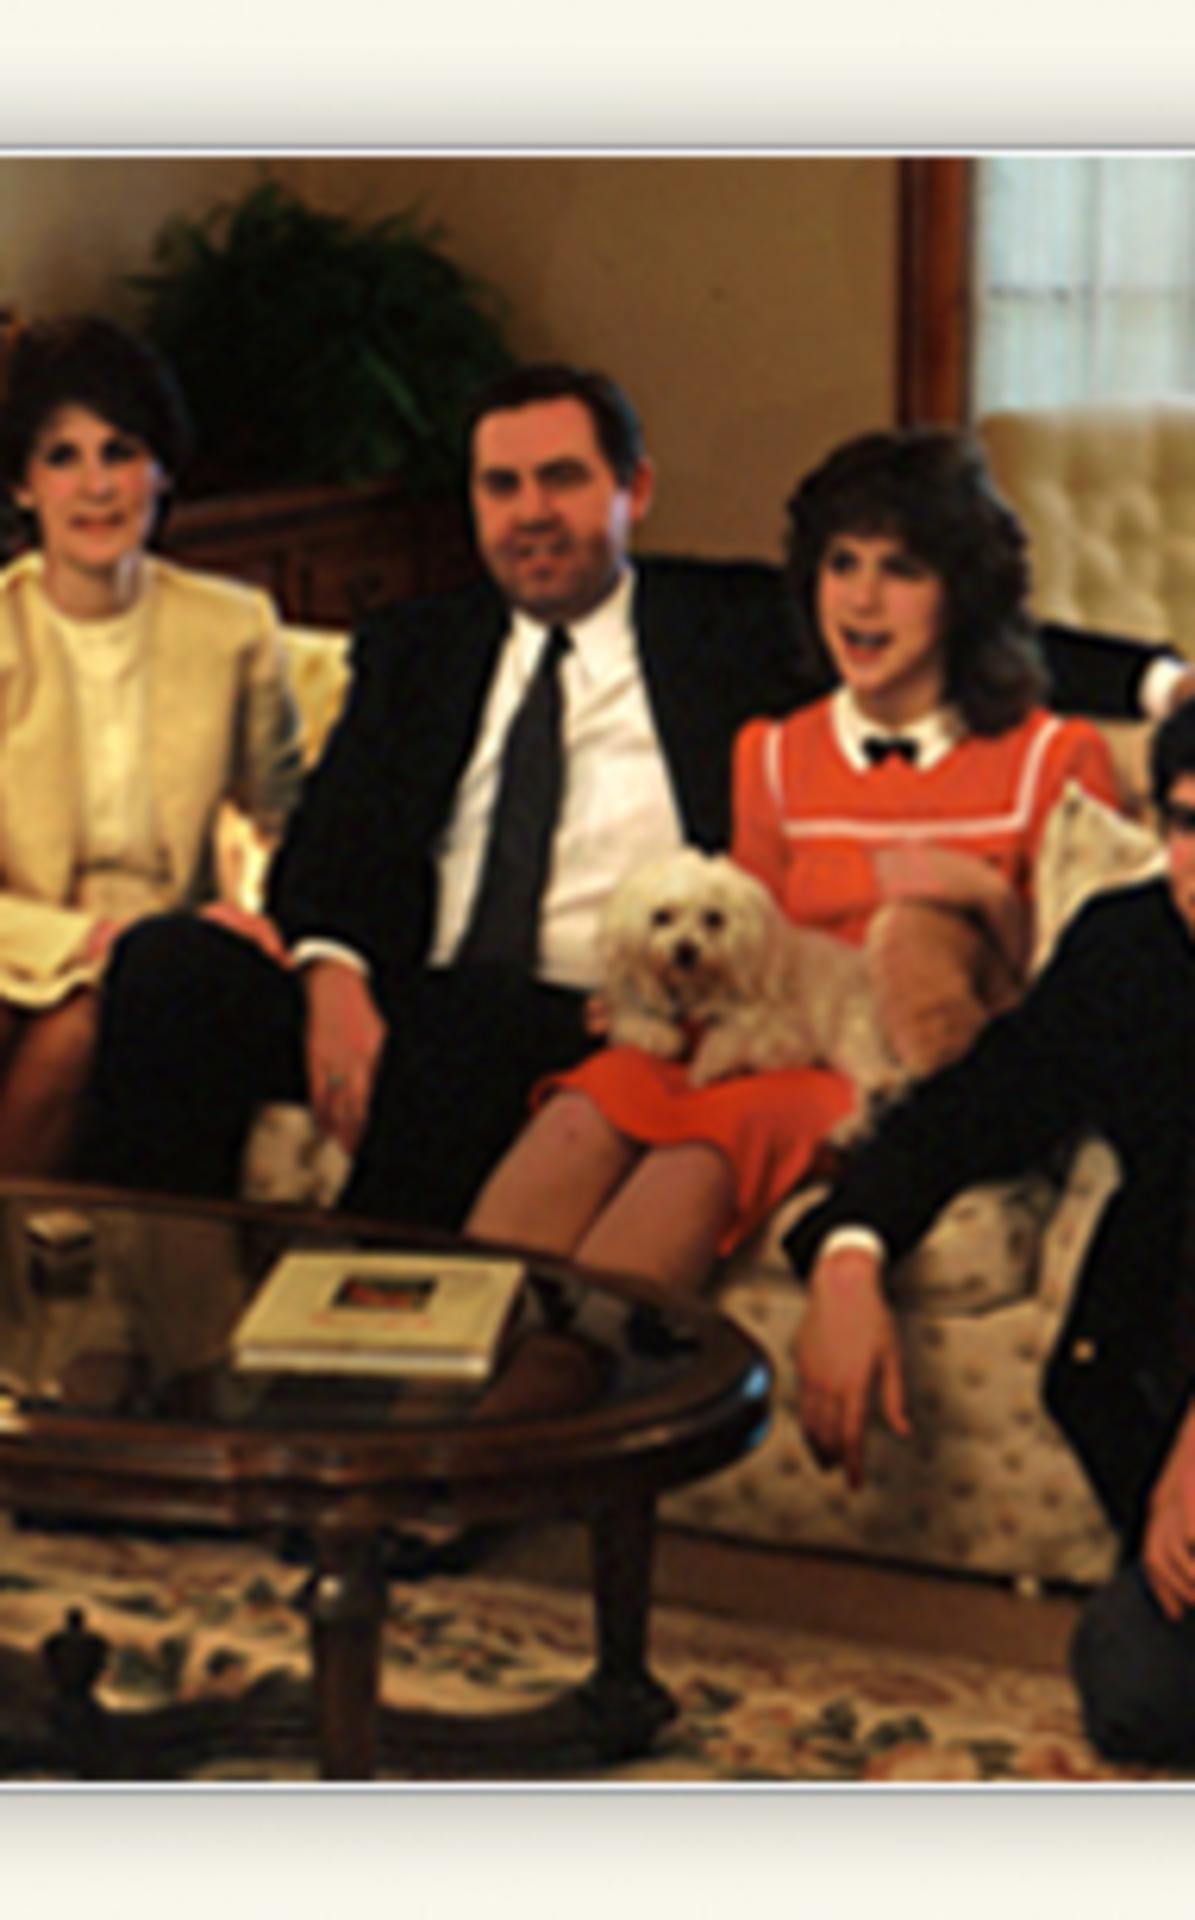 holland-family-biography385x307.jpg